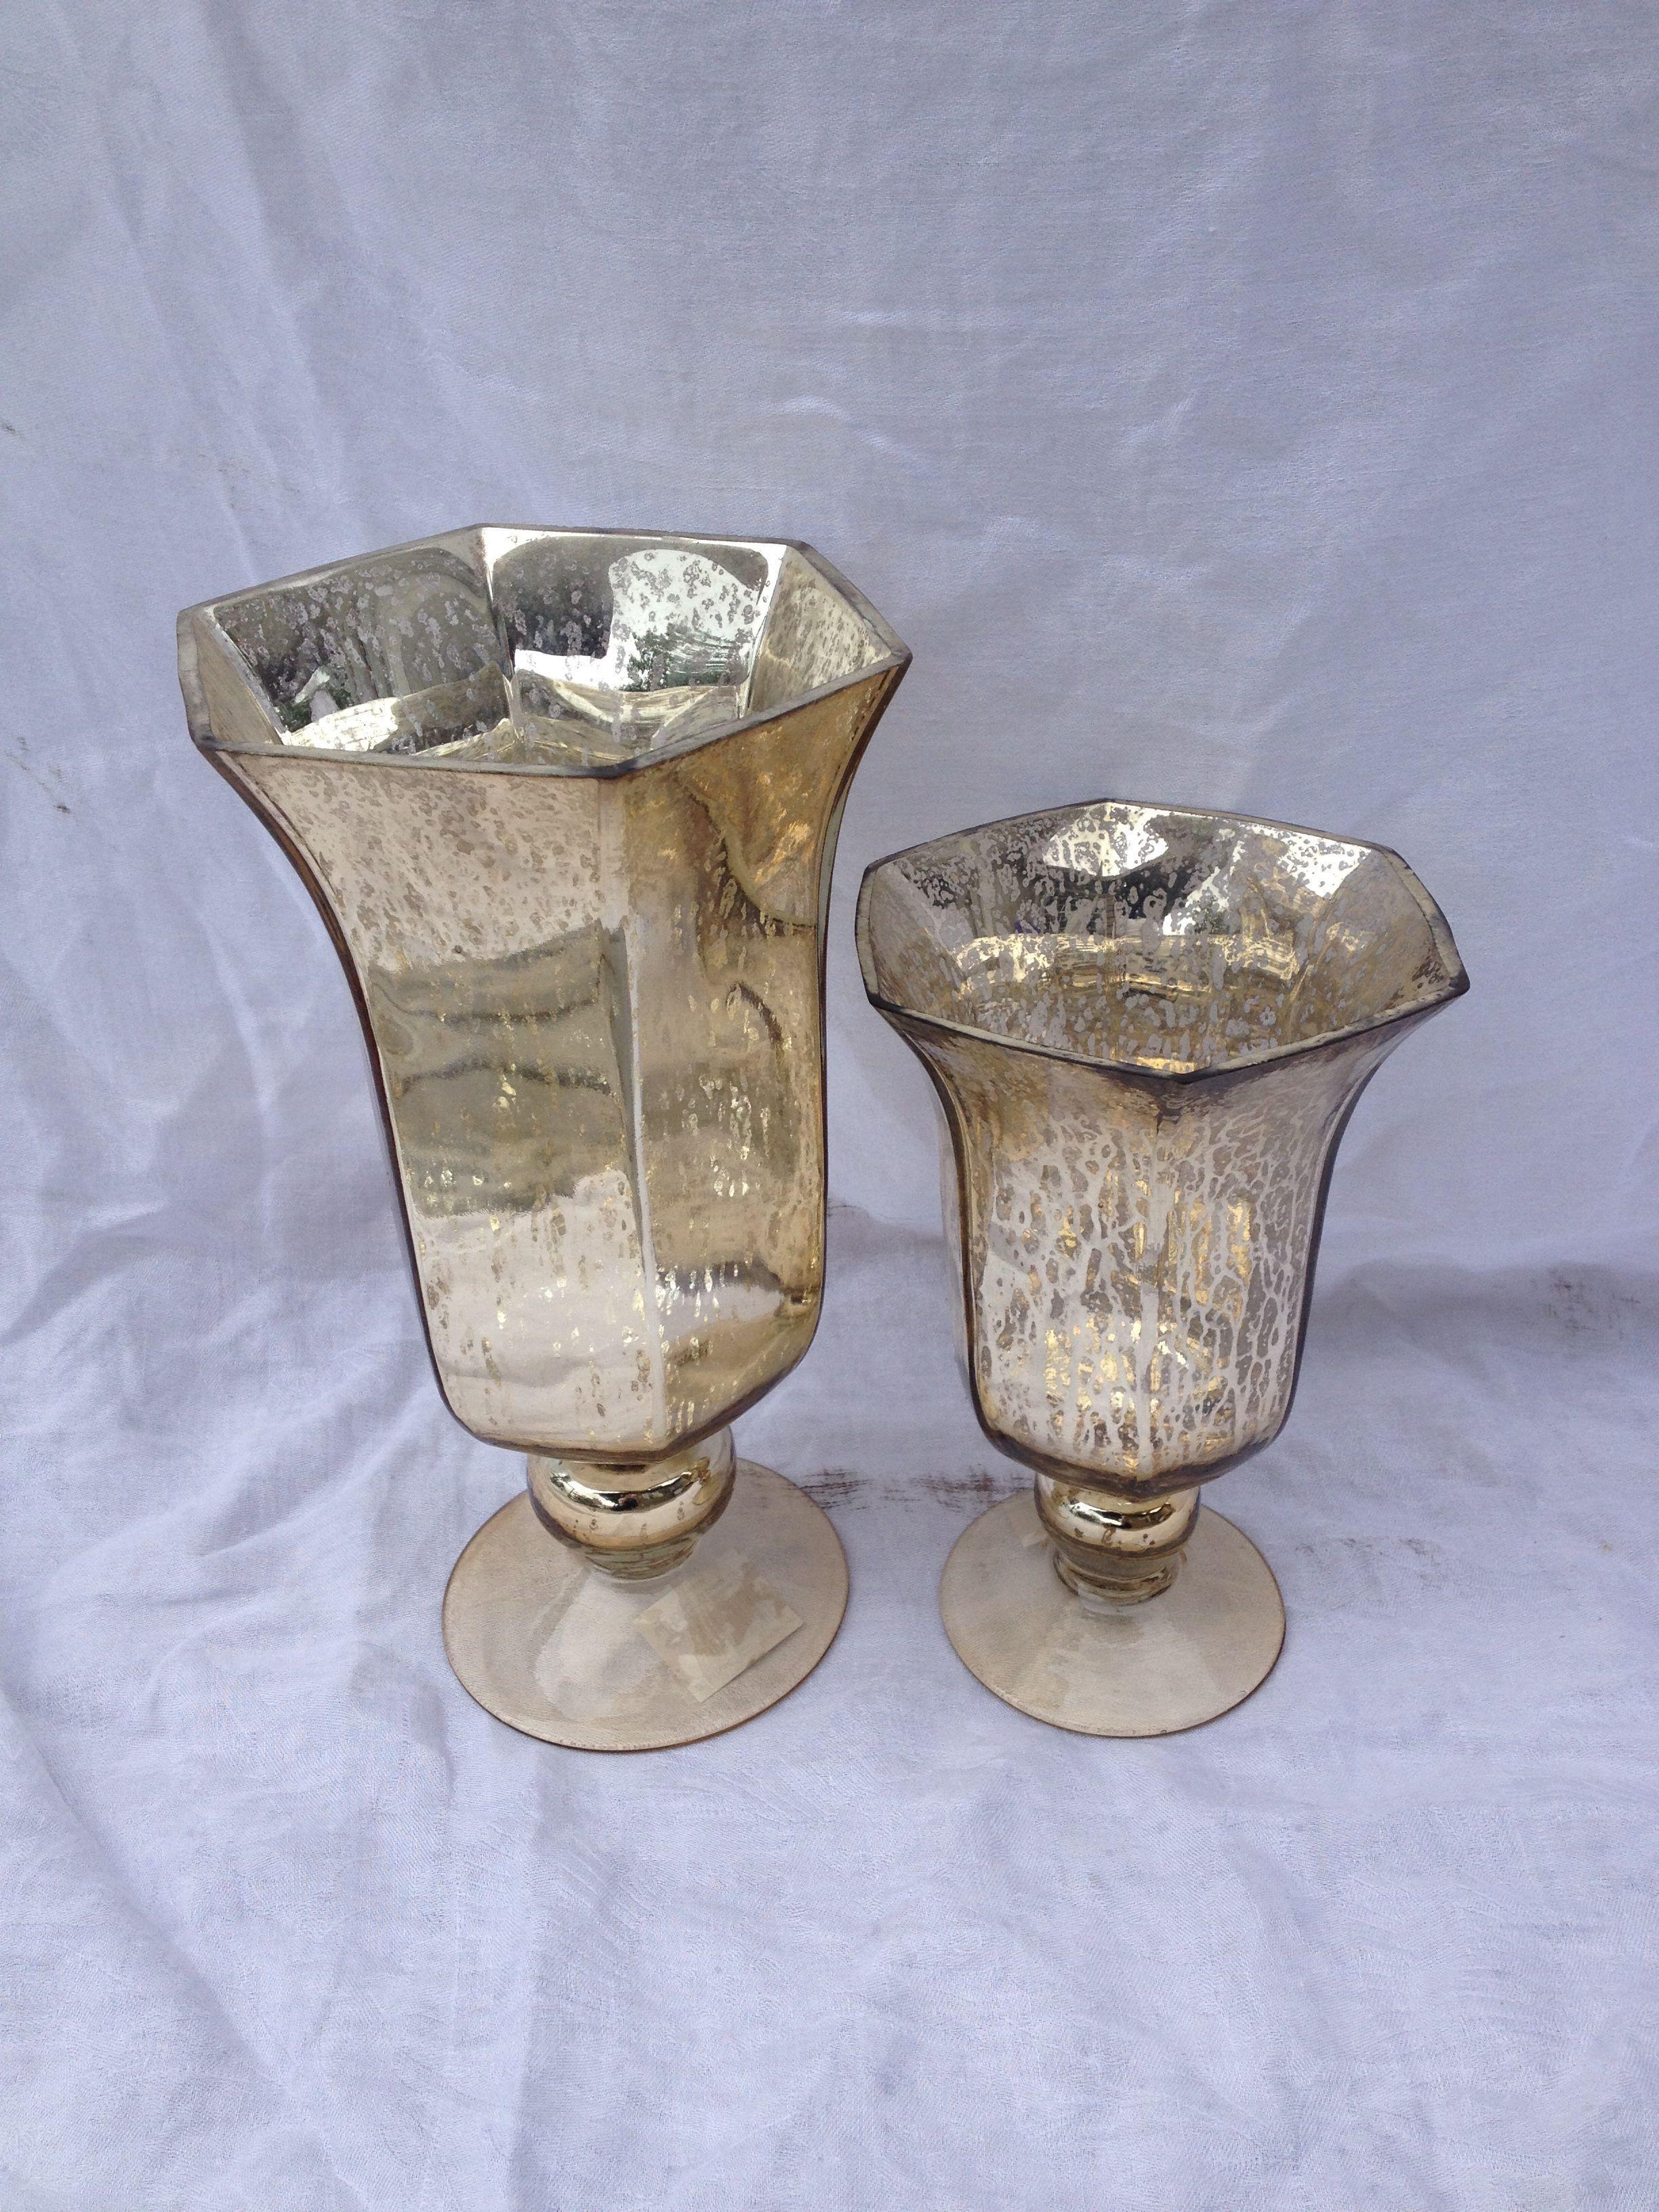 7 square glass vase of 34 gold mercury glass vases the weekly world pertaining to gold mercury glass lida vase inspiration pinterest